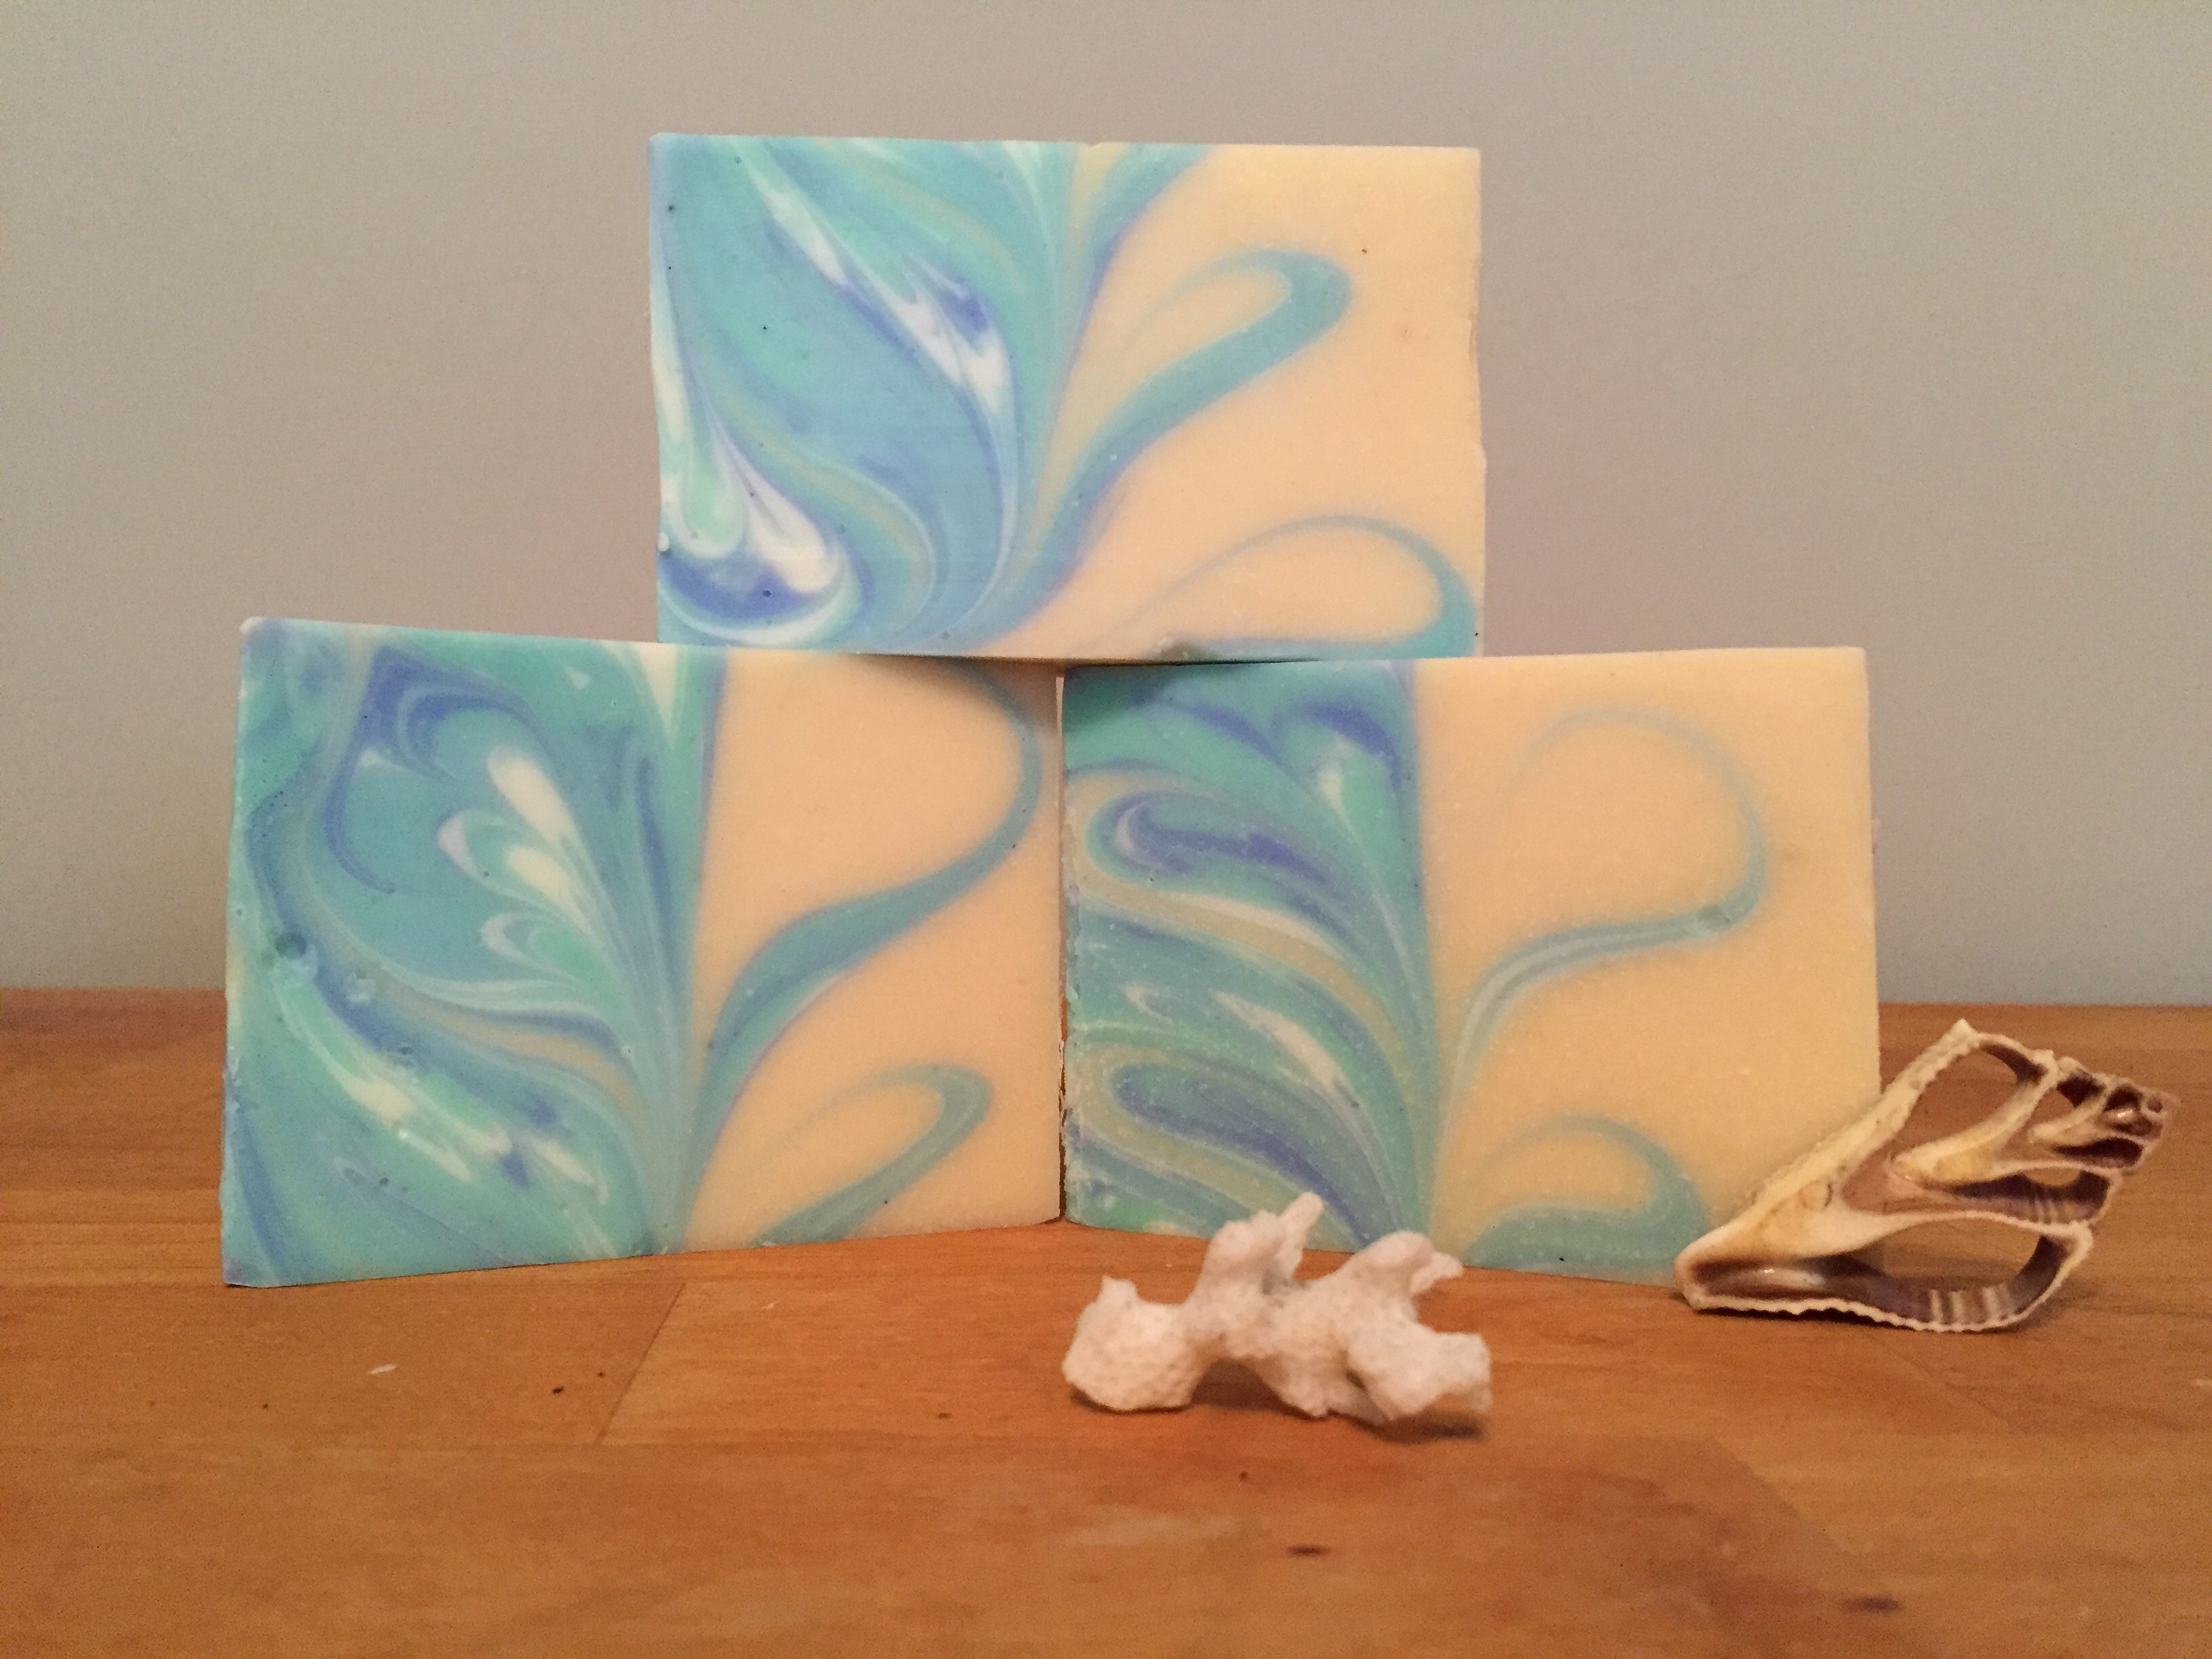 sand sea marble mantra swirl